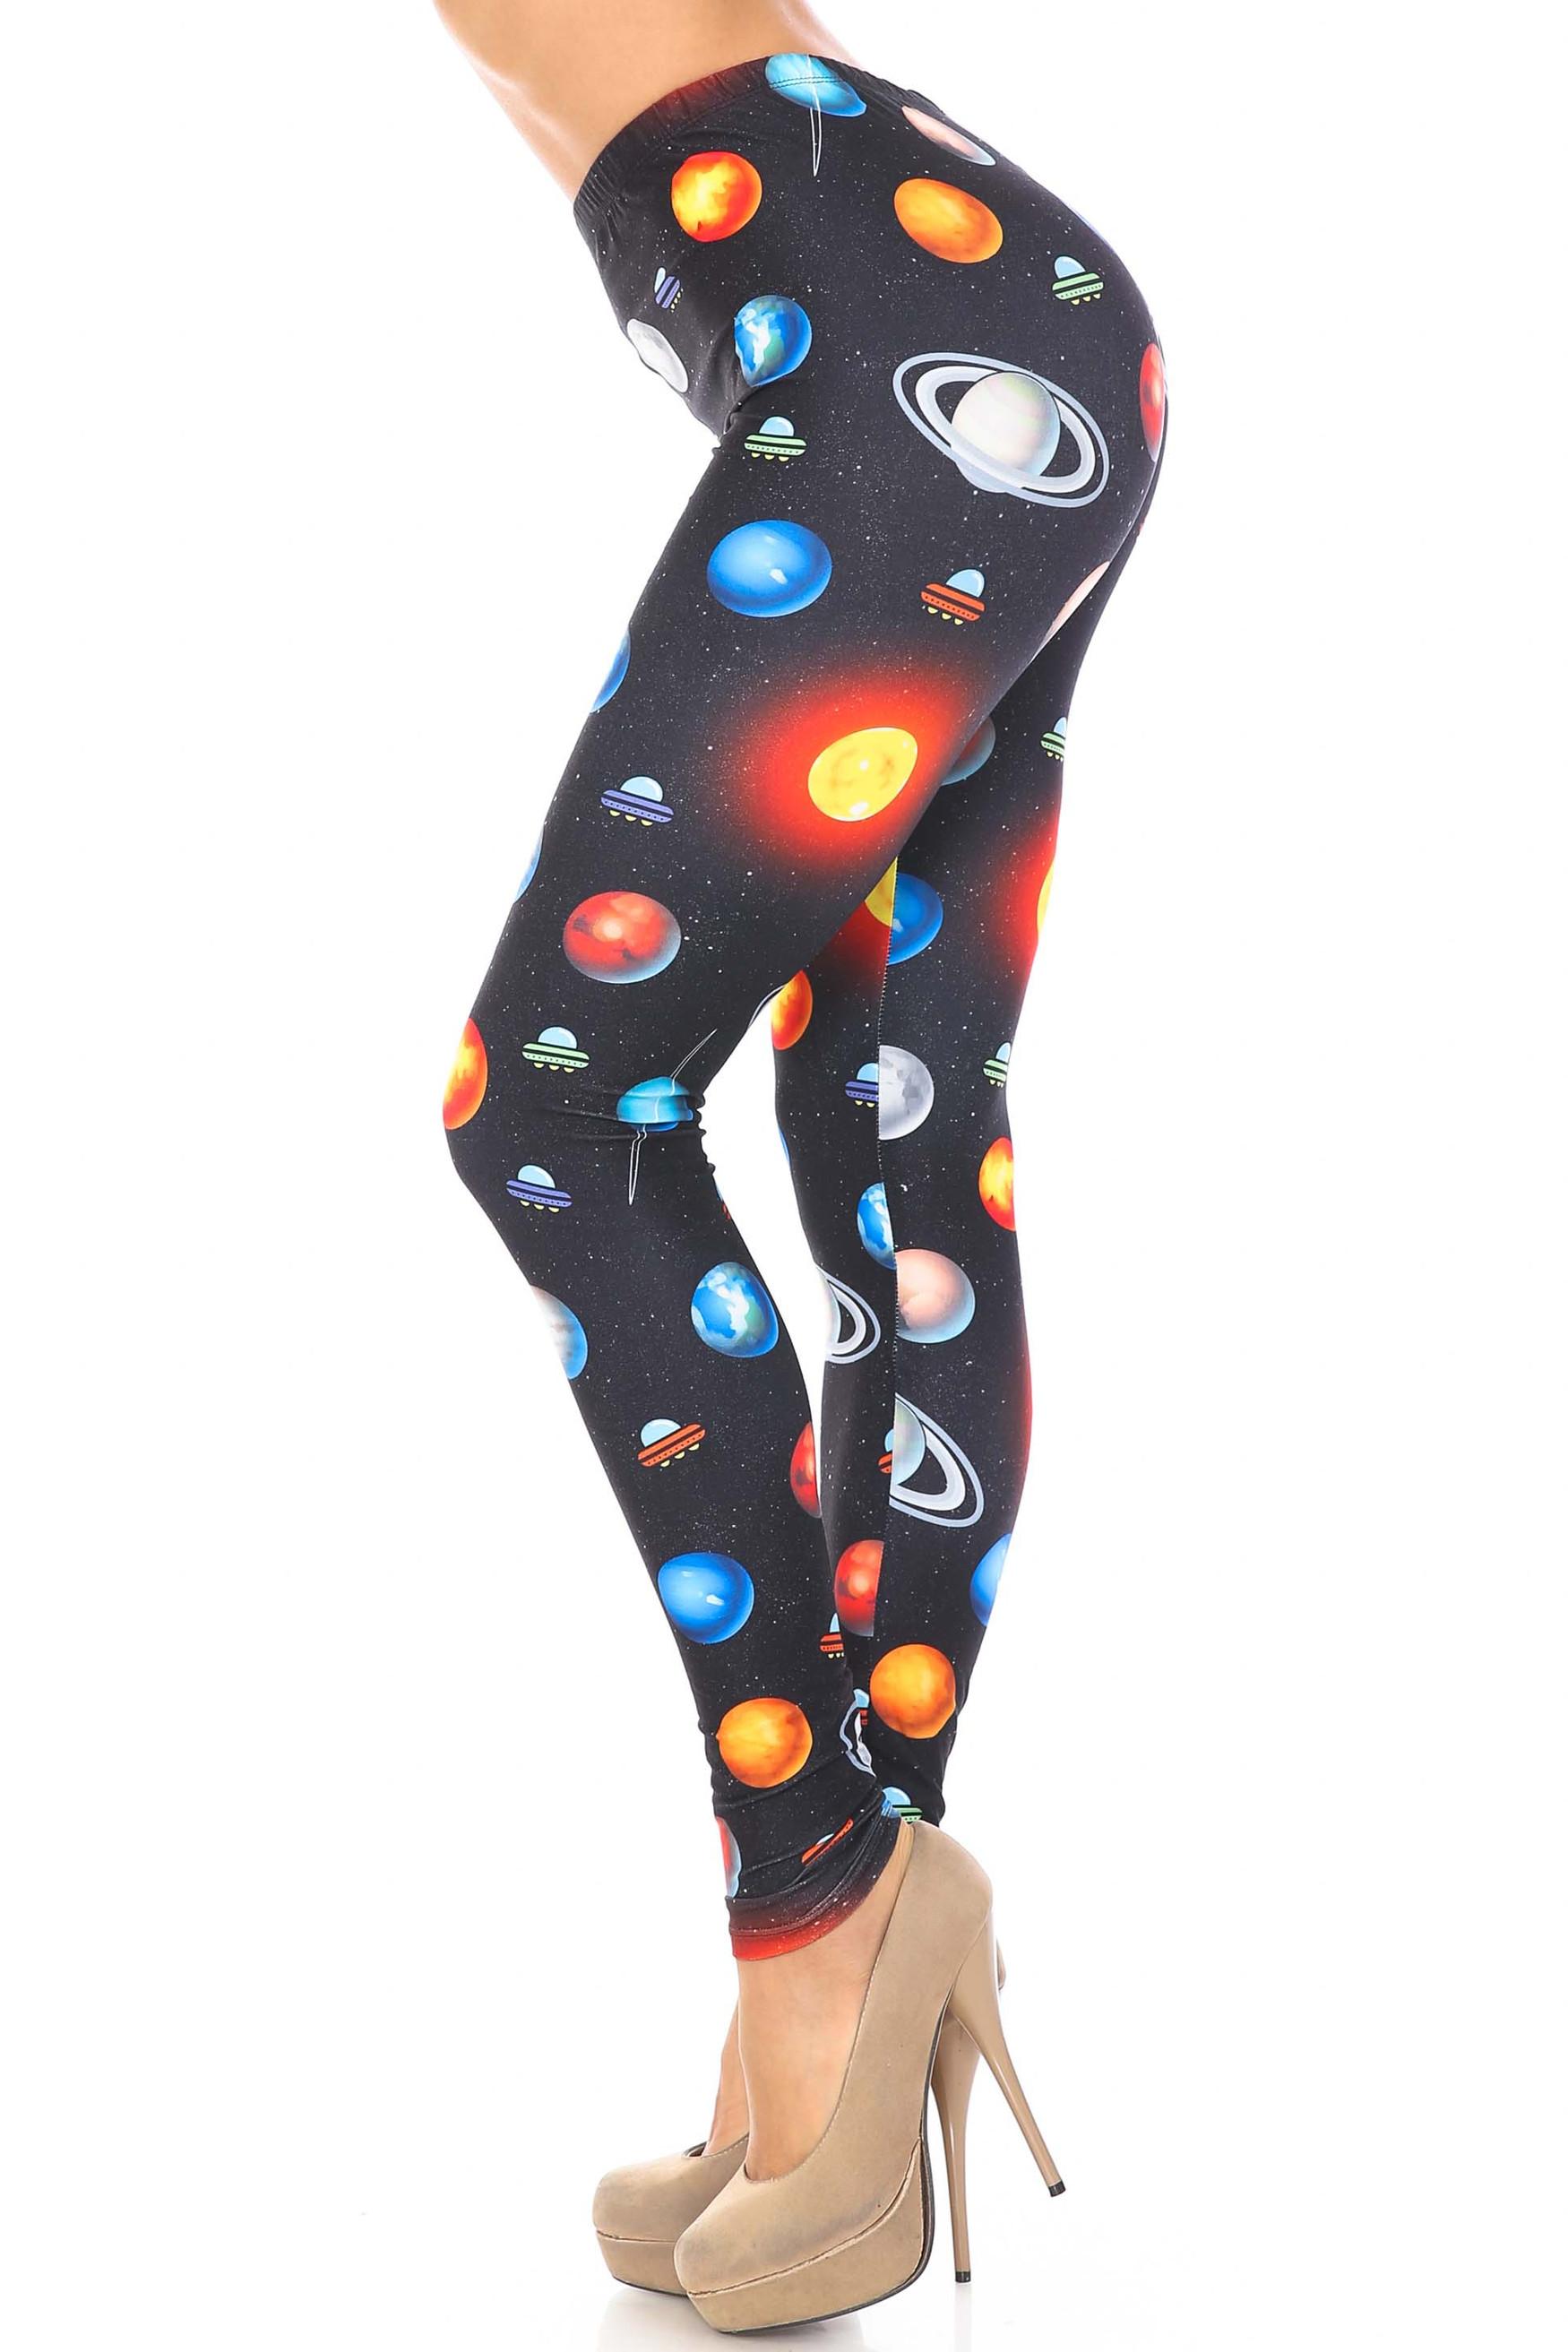 Creamy Soft Galaxy Planets Extra Plus Size Leggings - 3X-5X - USA Fashion™